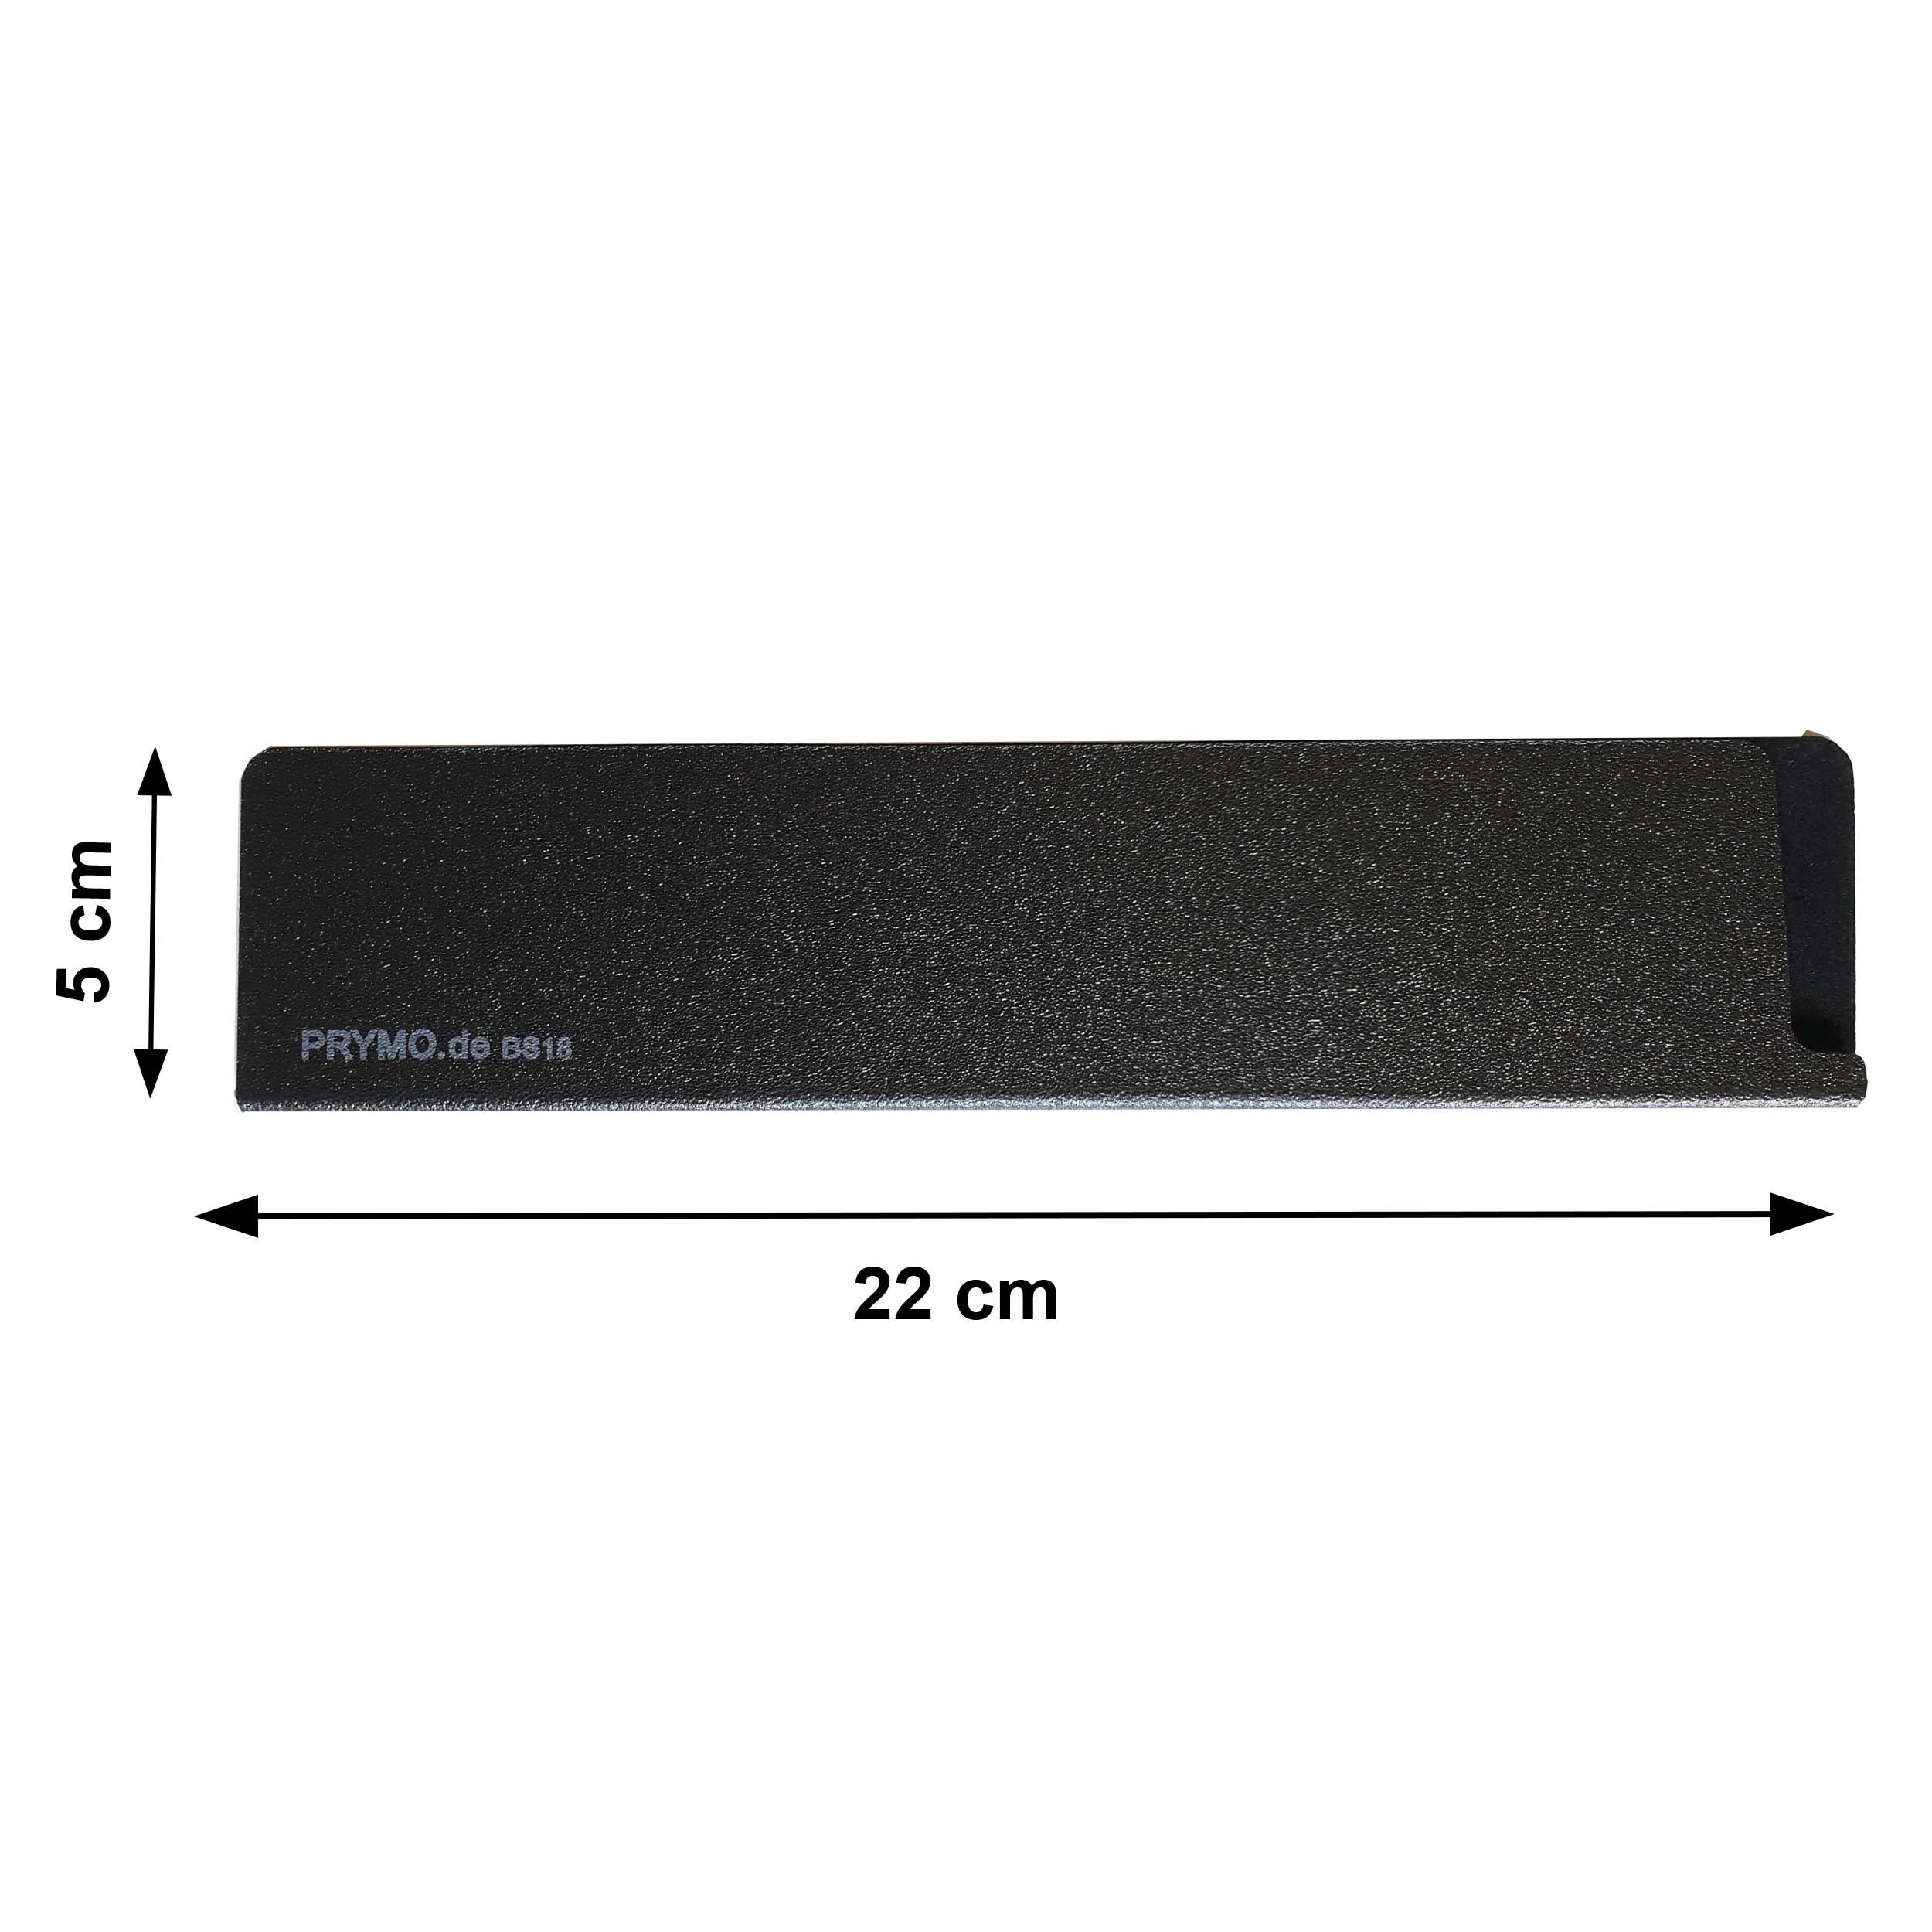 PRYMO BladeShield BS18 Klingenschutz 22,0 x 5,0 cm